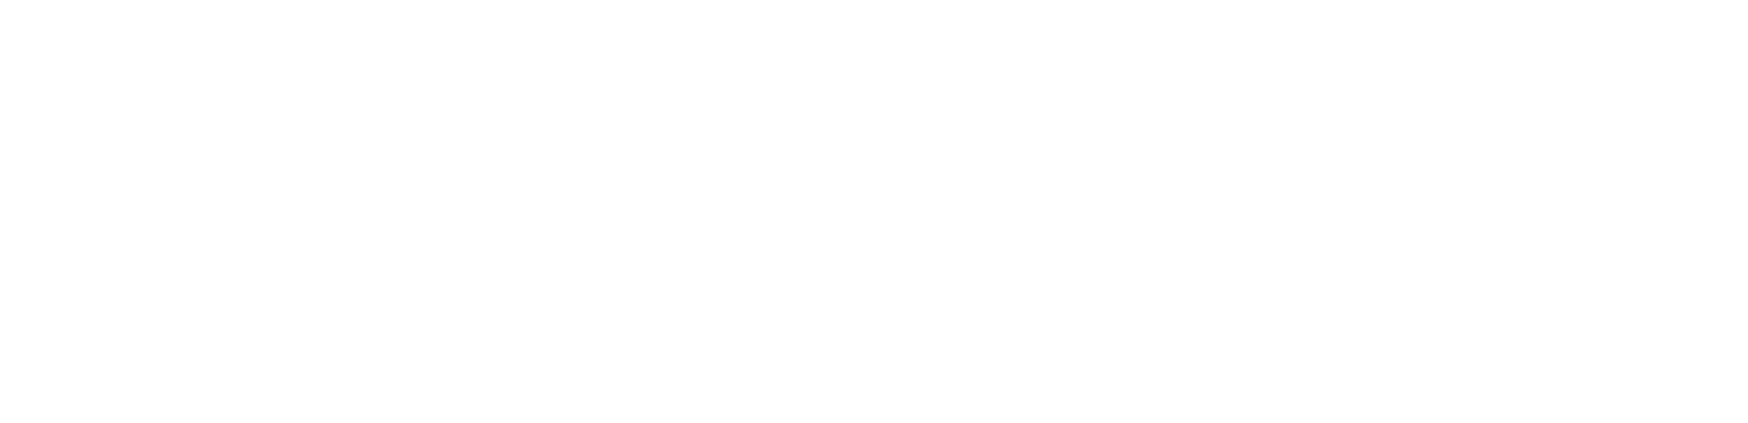 We-Vibe_logo_2018_WHITE.png